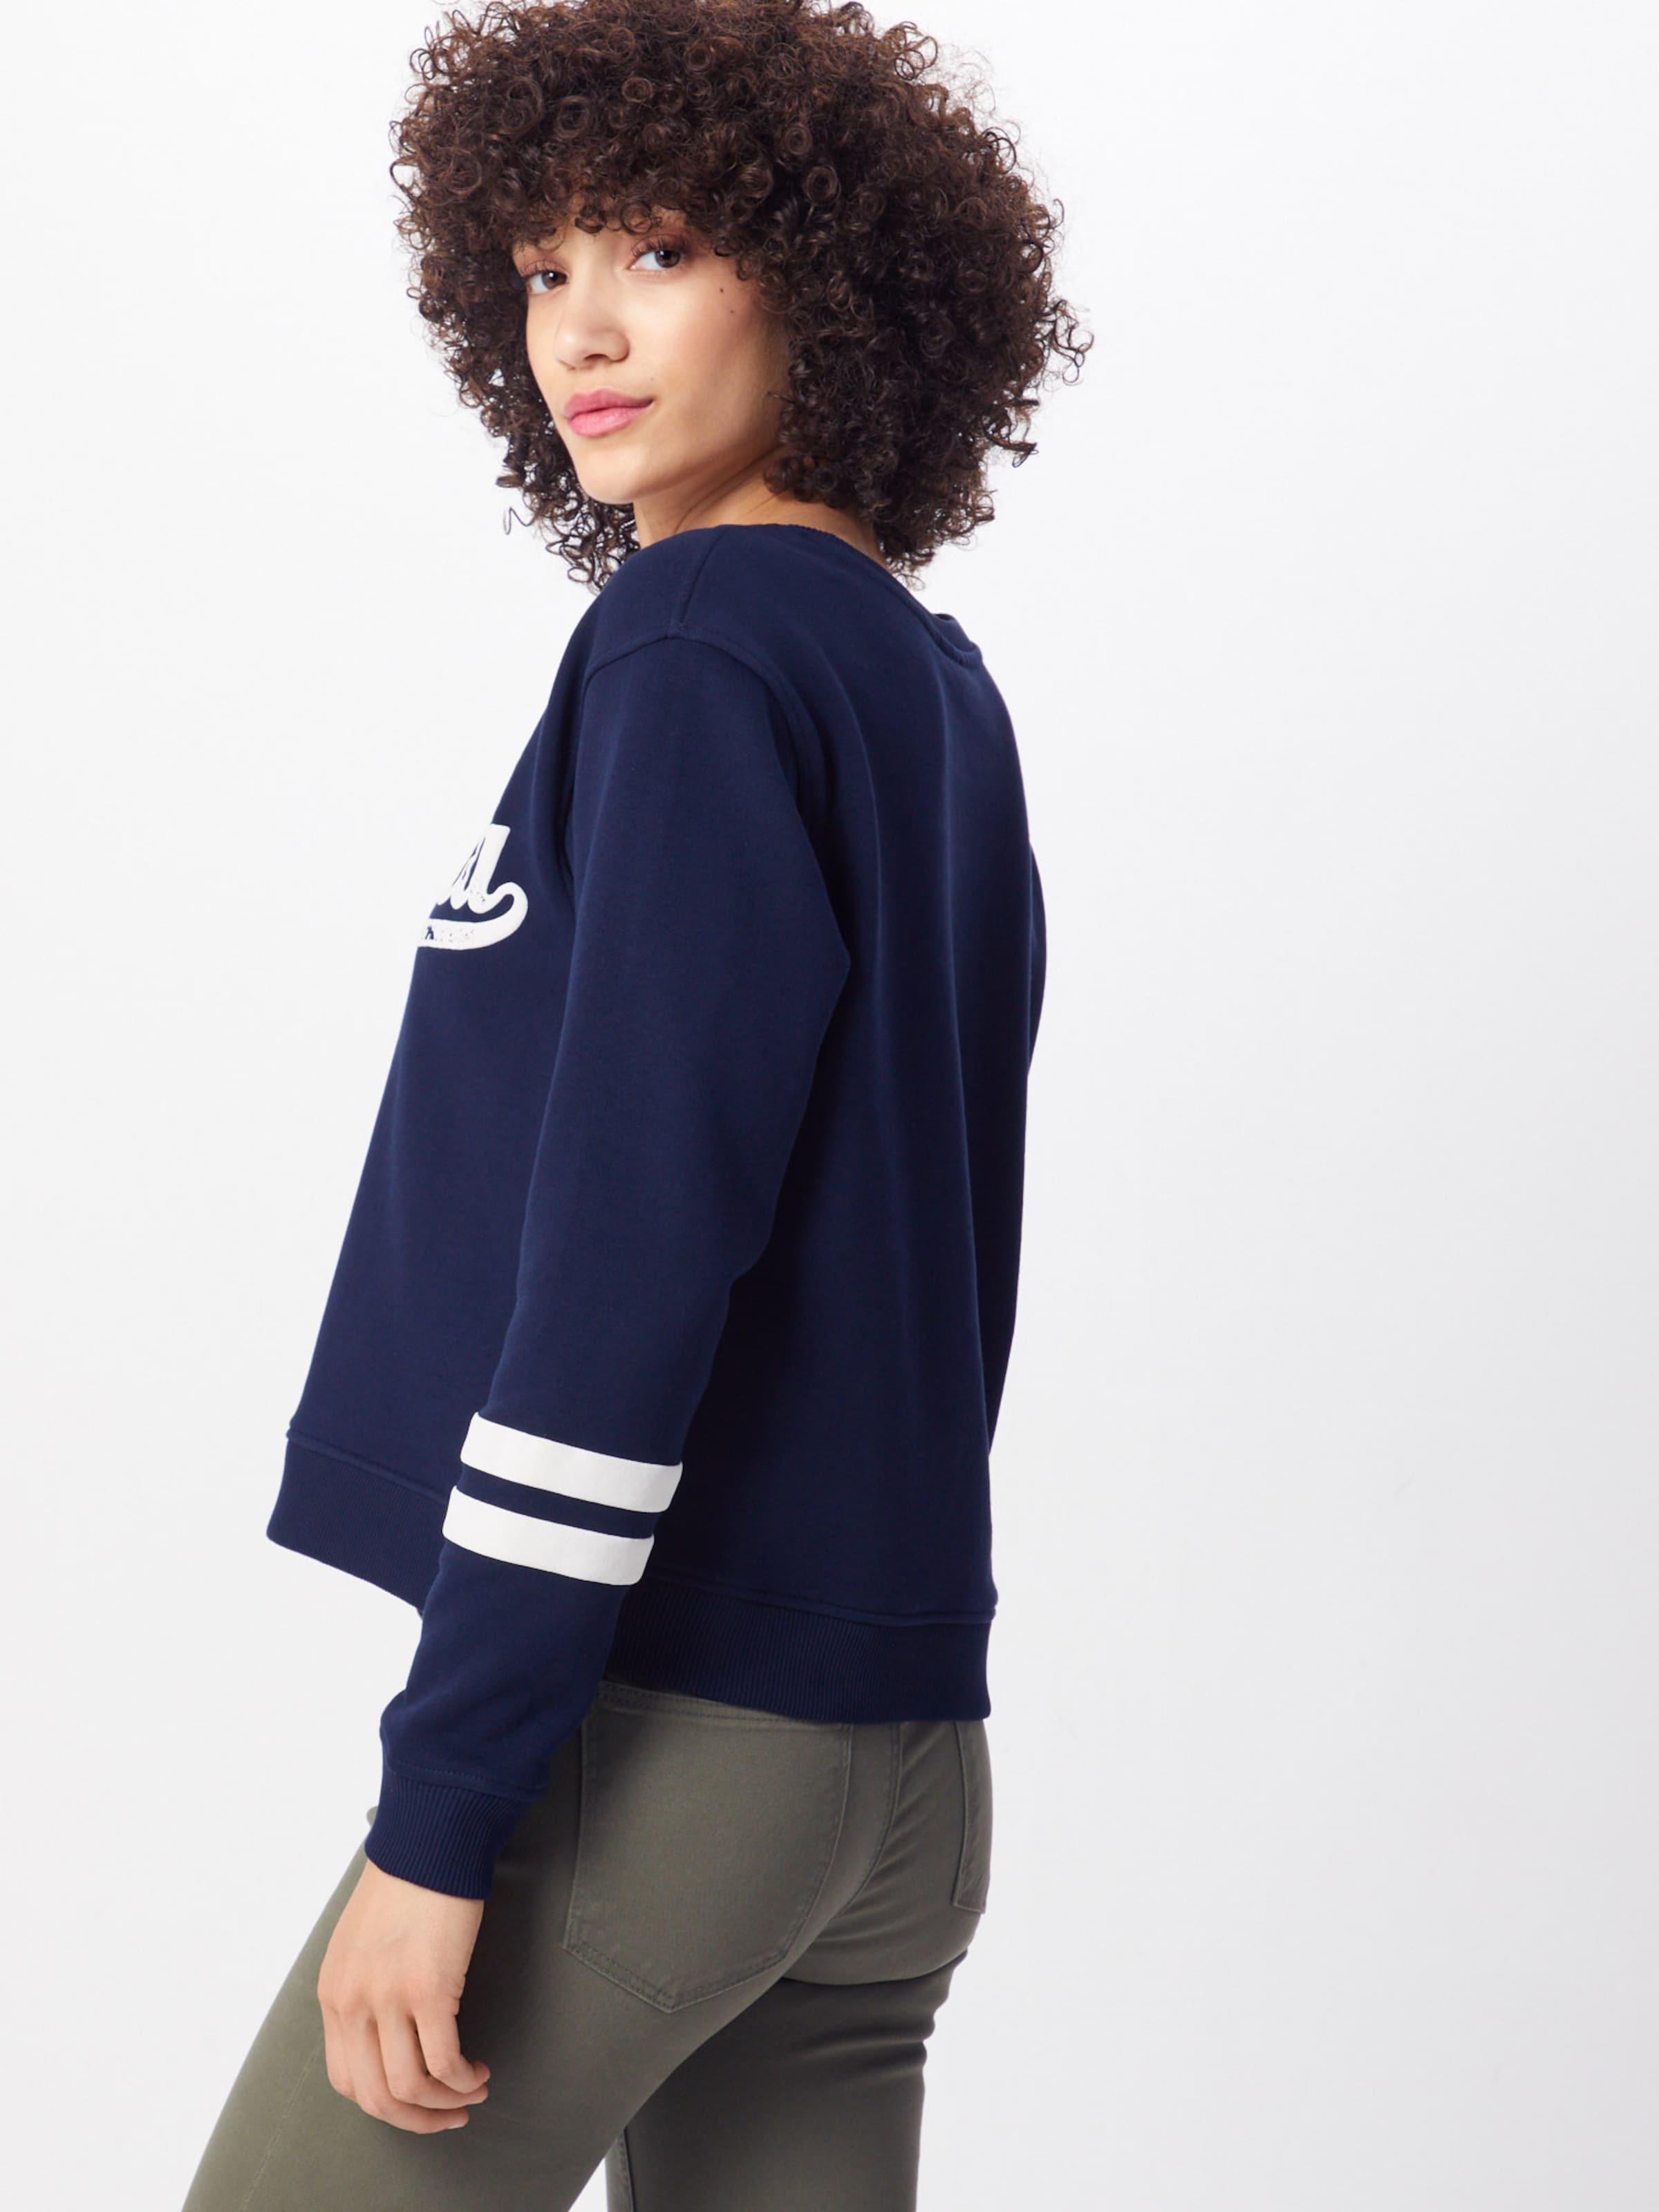 En Jacqueline 'ella' De NuitBlanc shirt Bleu Yong Sweat vNOm08nw